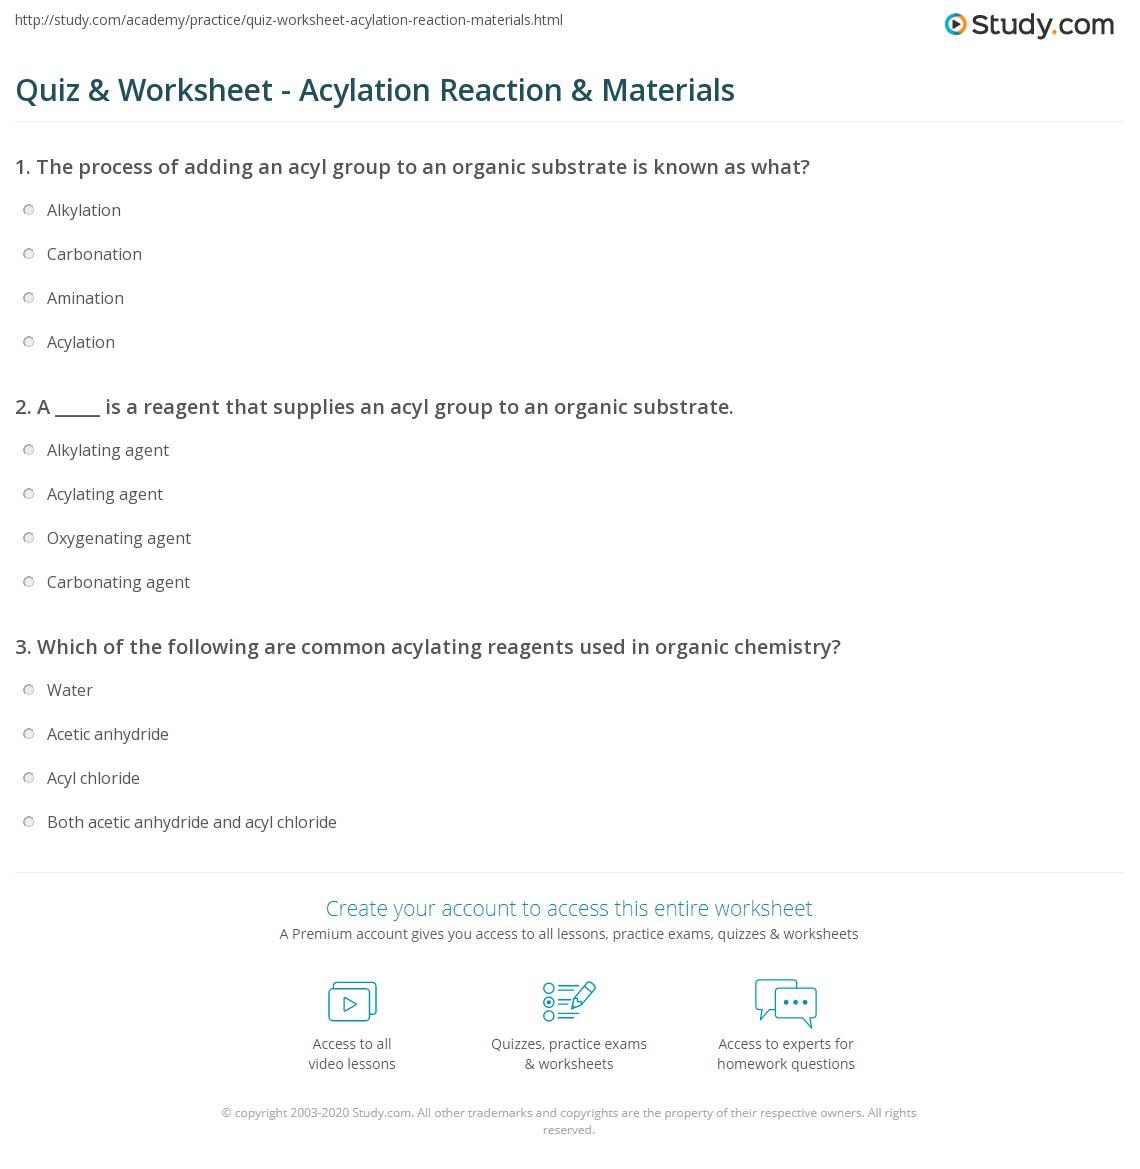 Quiz & Worksheet - Acylation Reaction & Materials | Study com